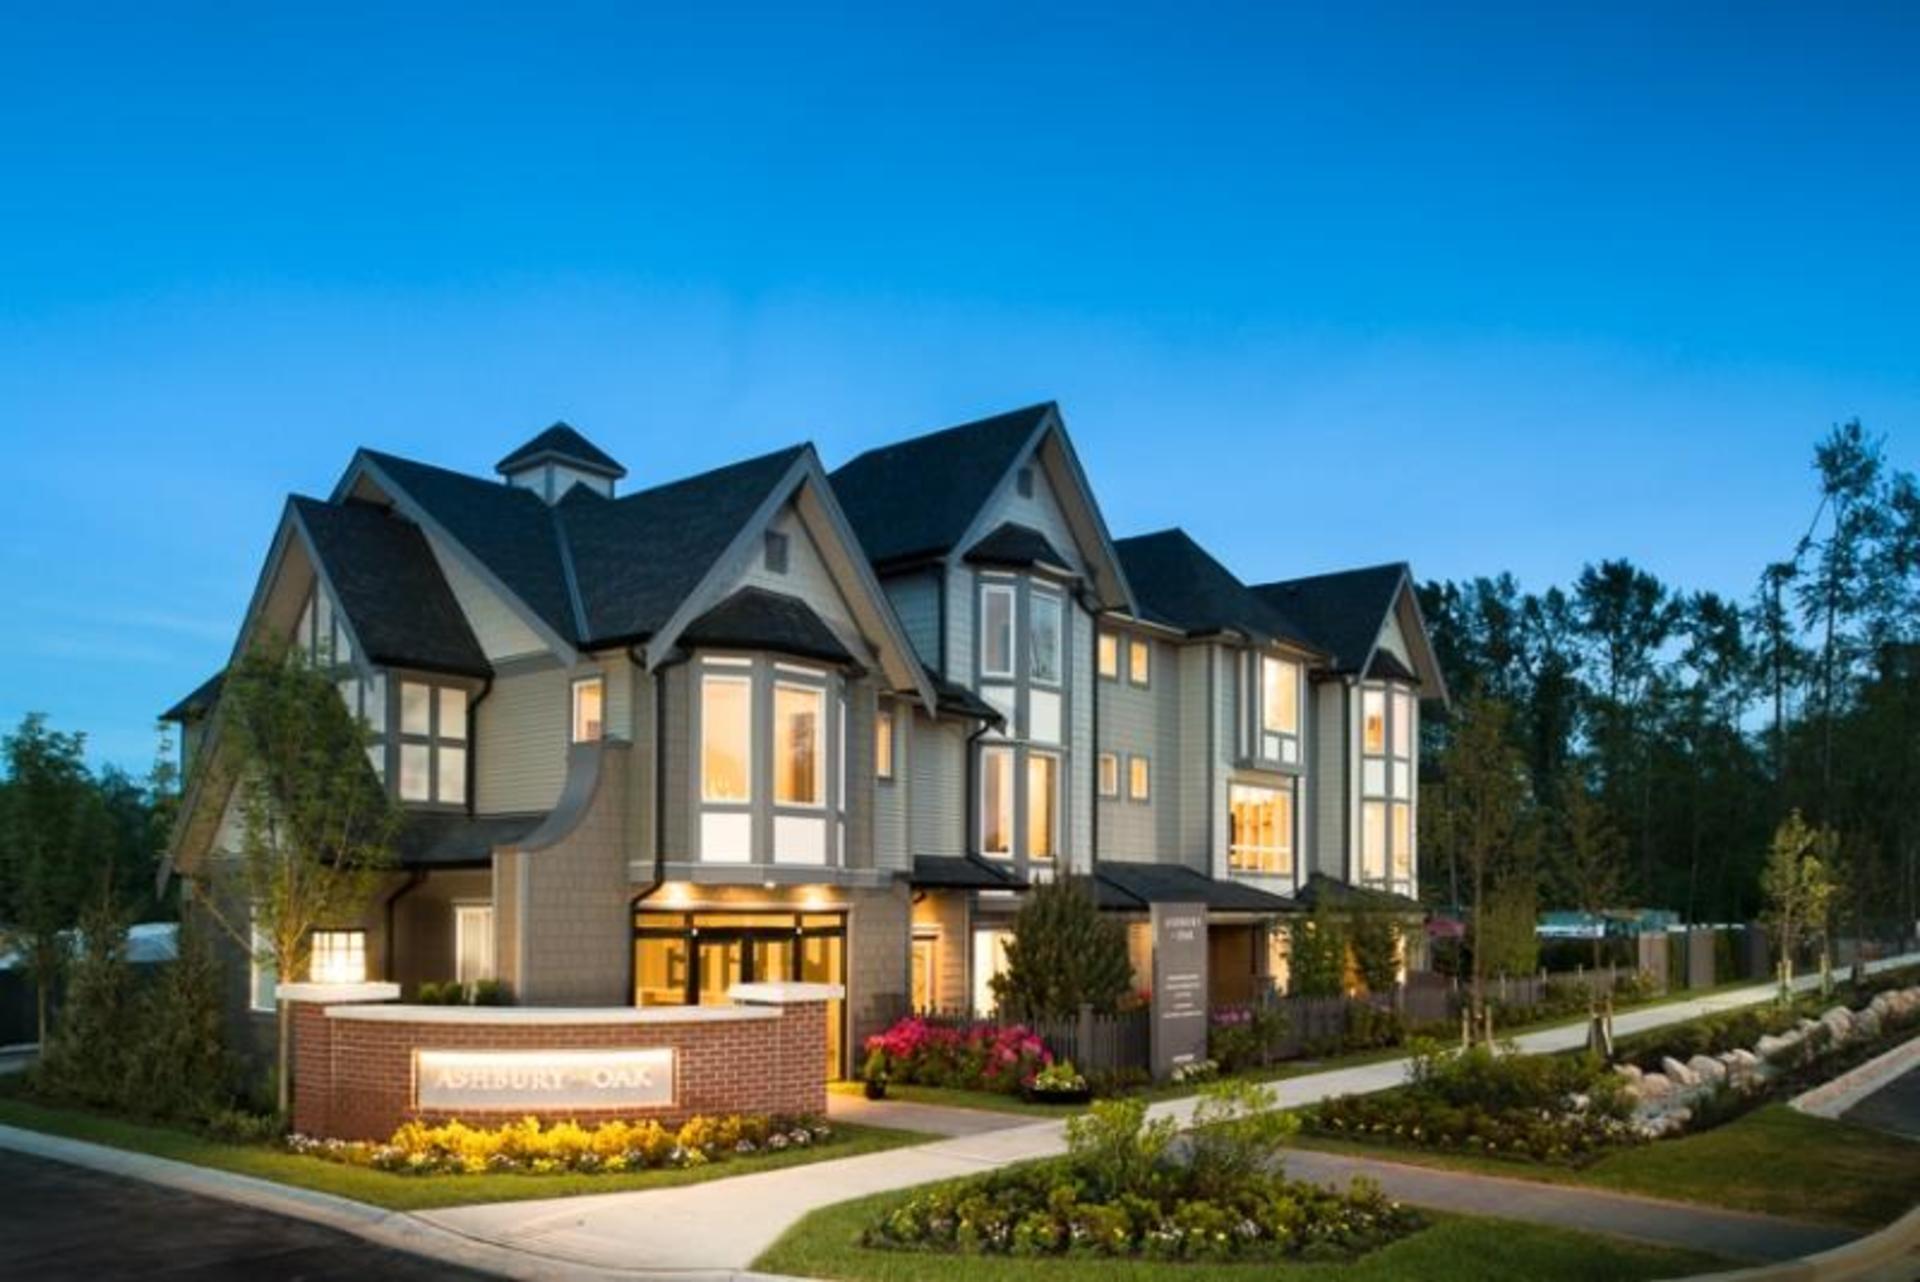 2016_06_16_03_32_46_polygon_homes_langley_ashbury_oak_townhomes at Ashbury + Oak Townhomes (8138 204th Street, Willoughby Heights, Langley)